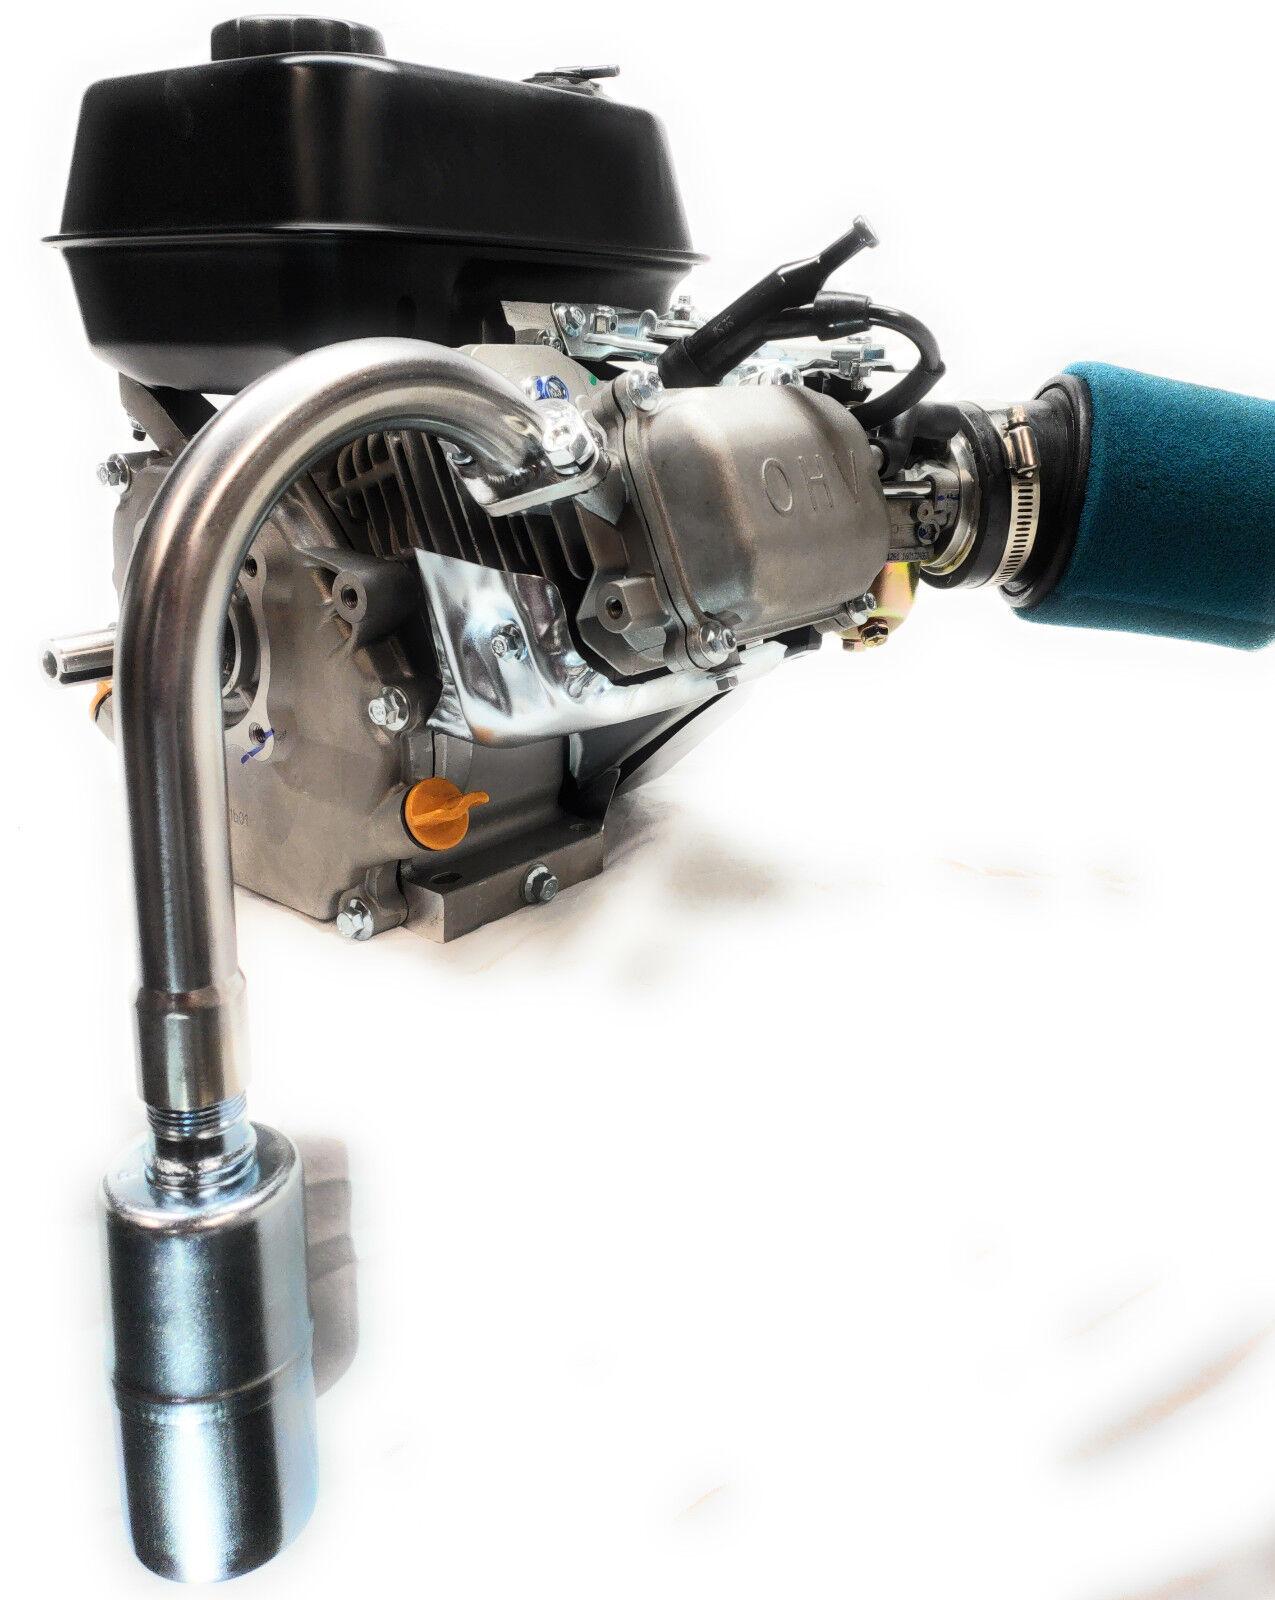 J Exhaust With Muffler for  Honda GX160 & GX200, Predator 212cc, DuroMax 7HP